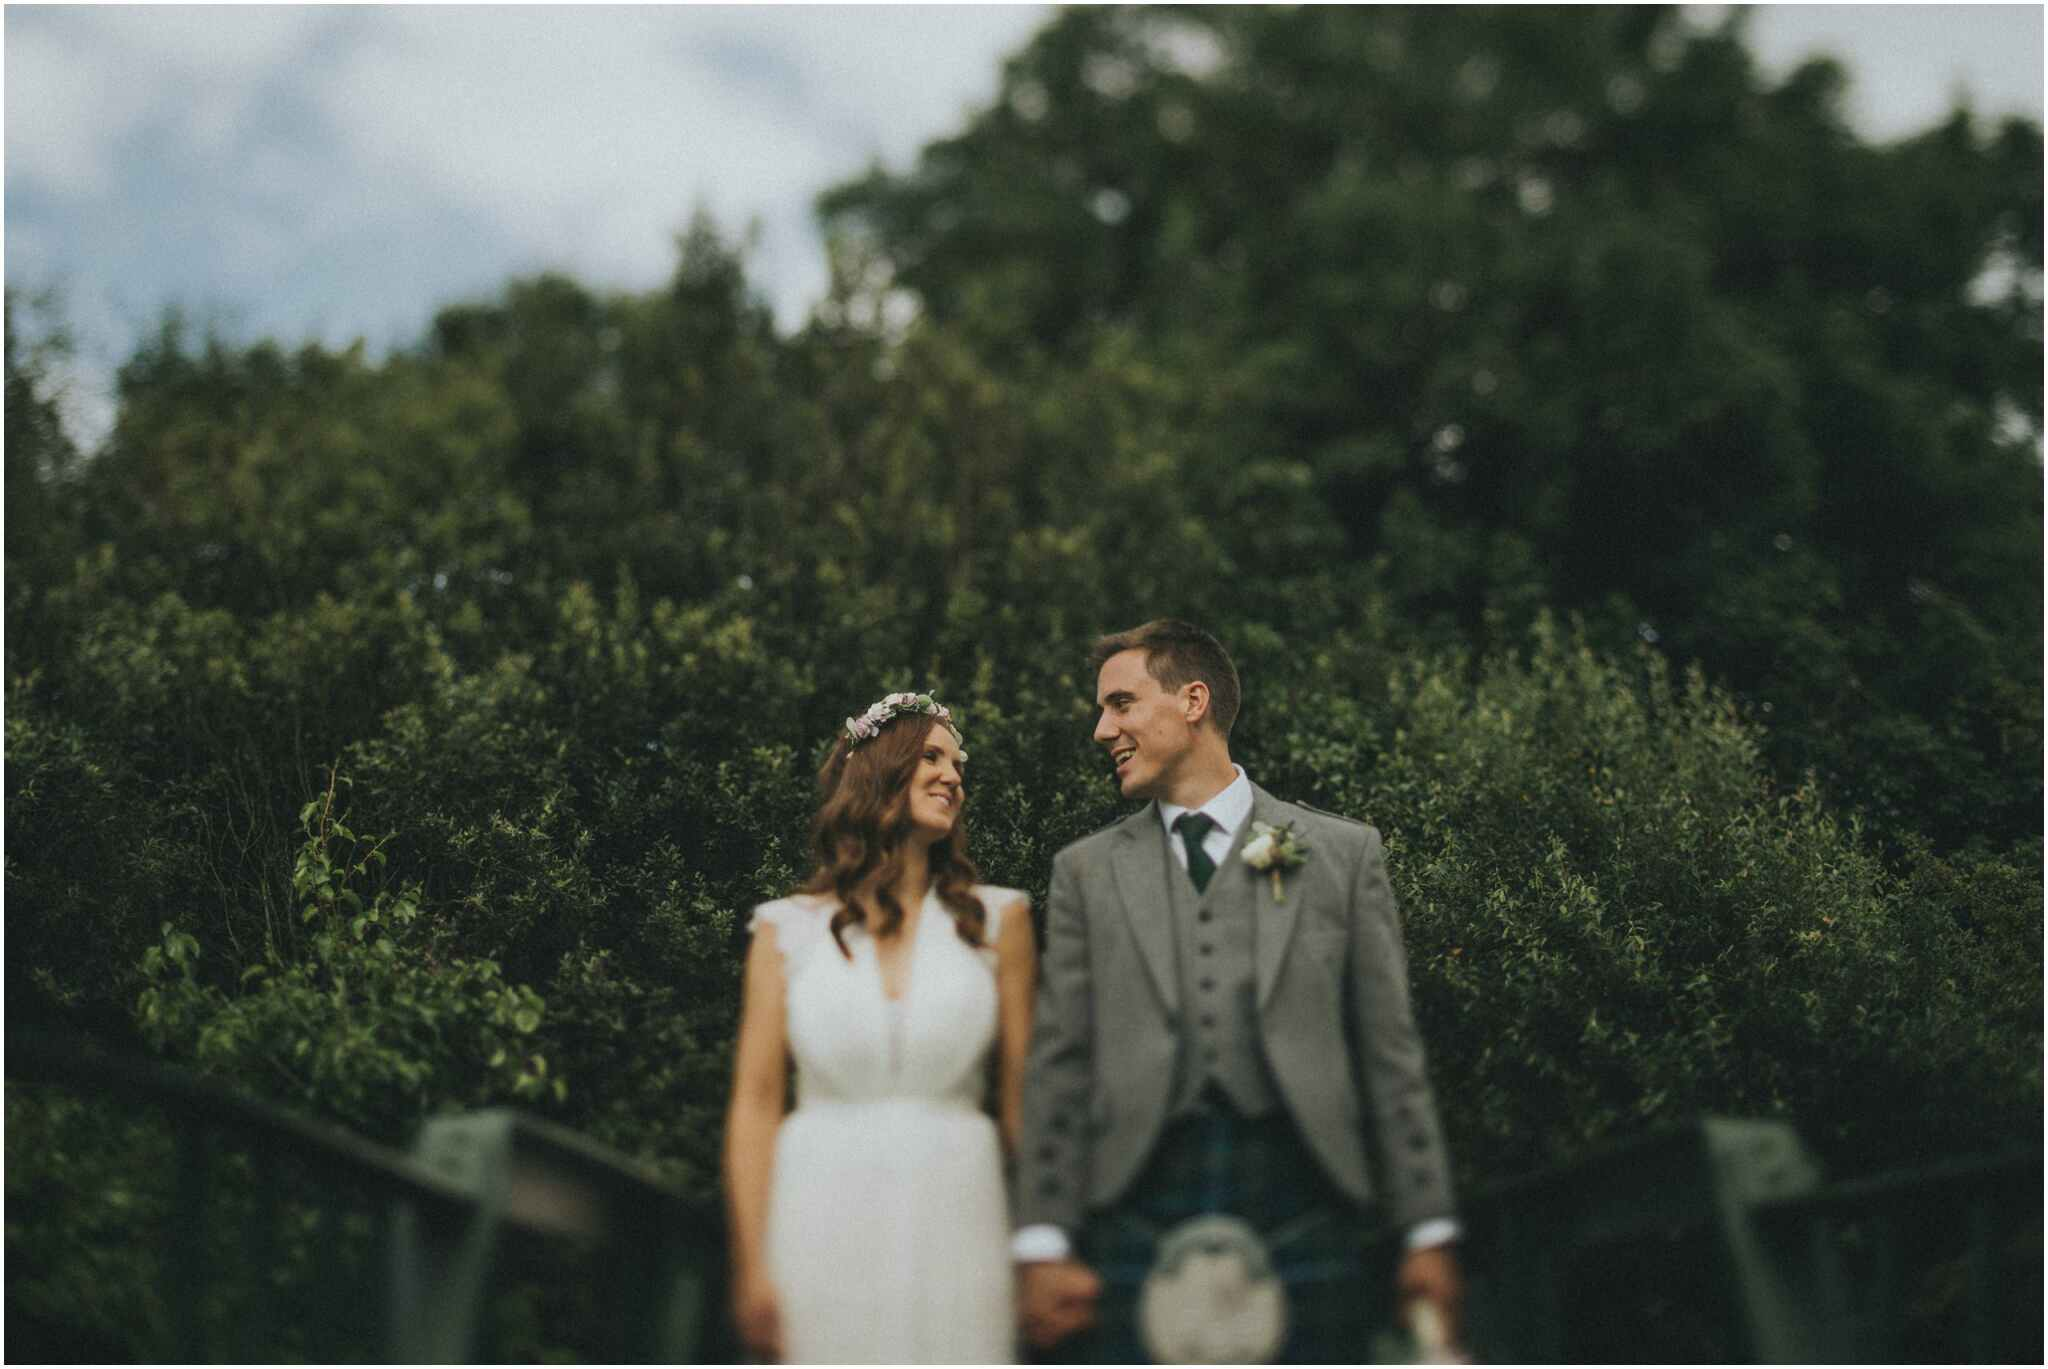 Fionnuala + Paul - Mount Druid Alternative Wedding 119